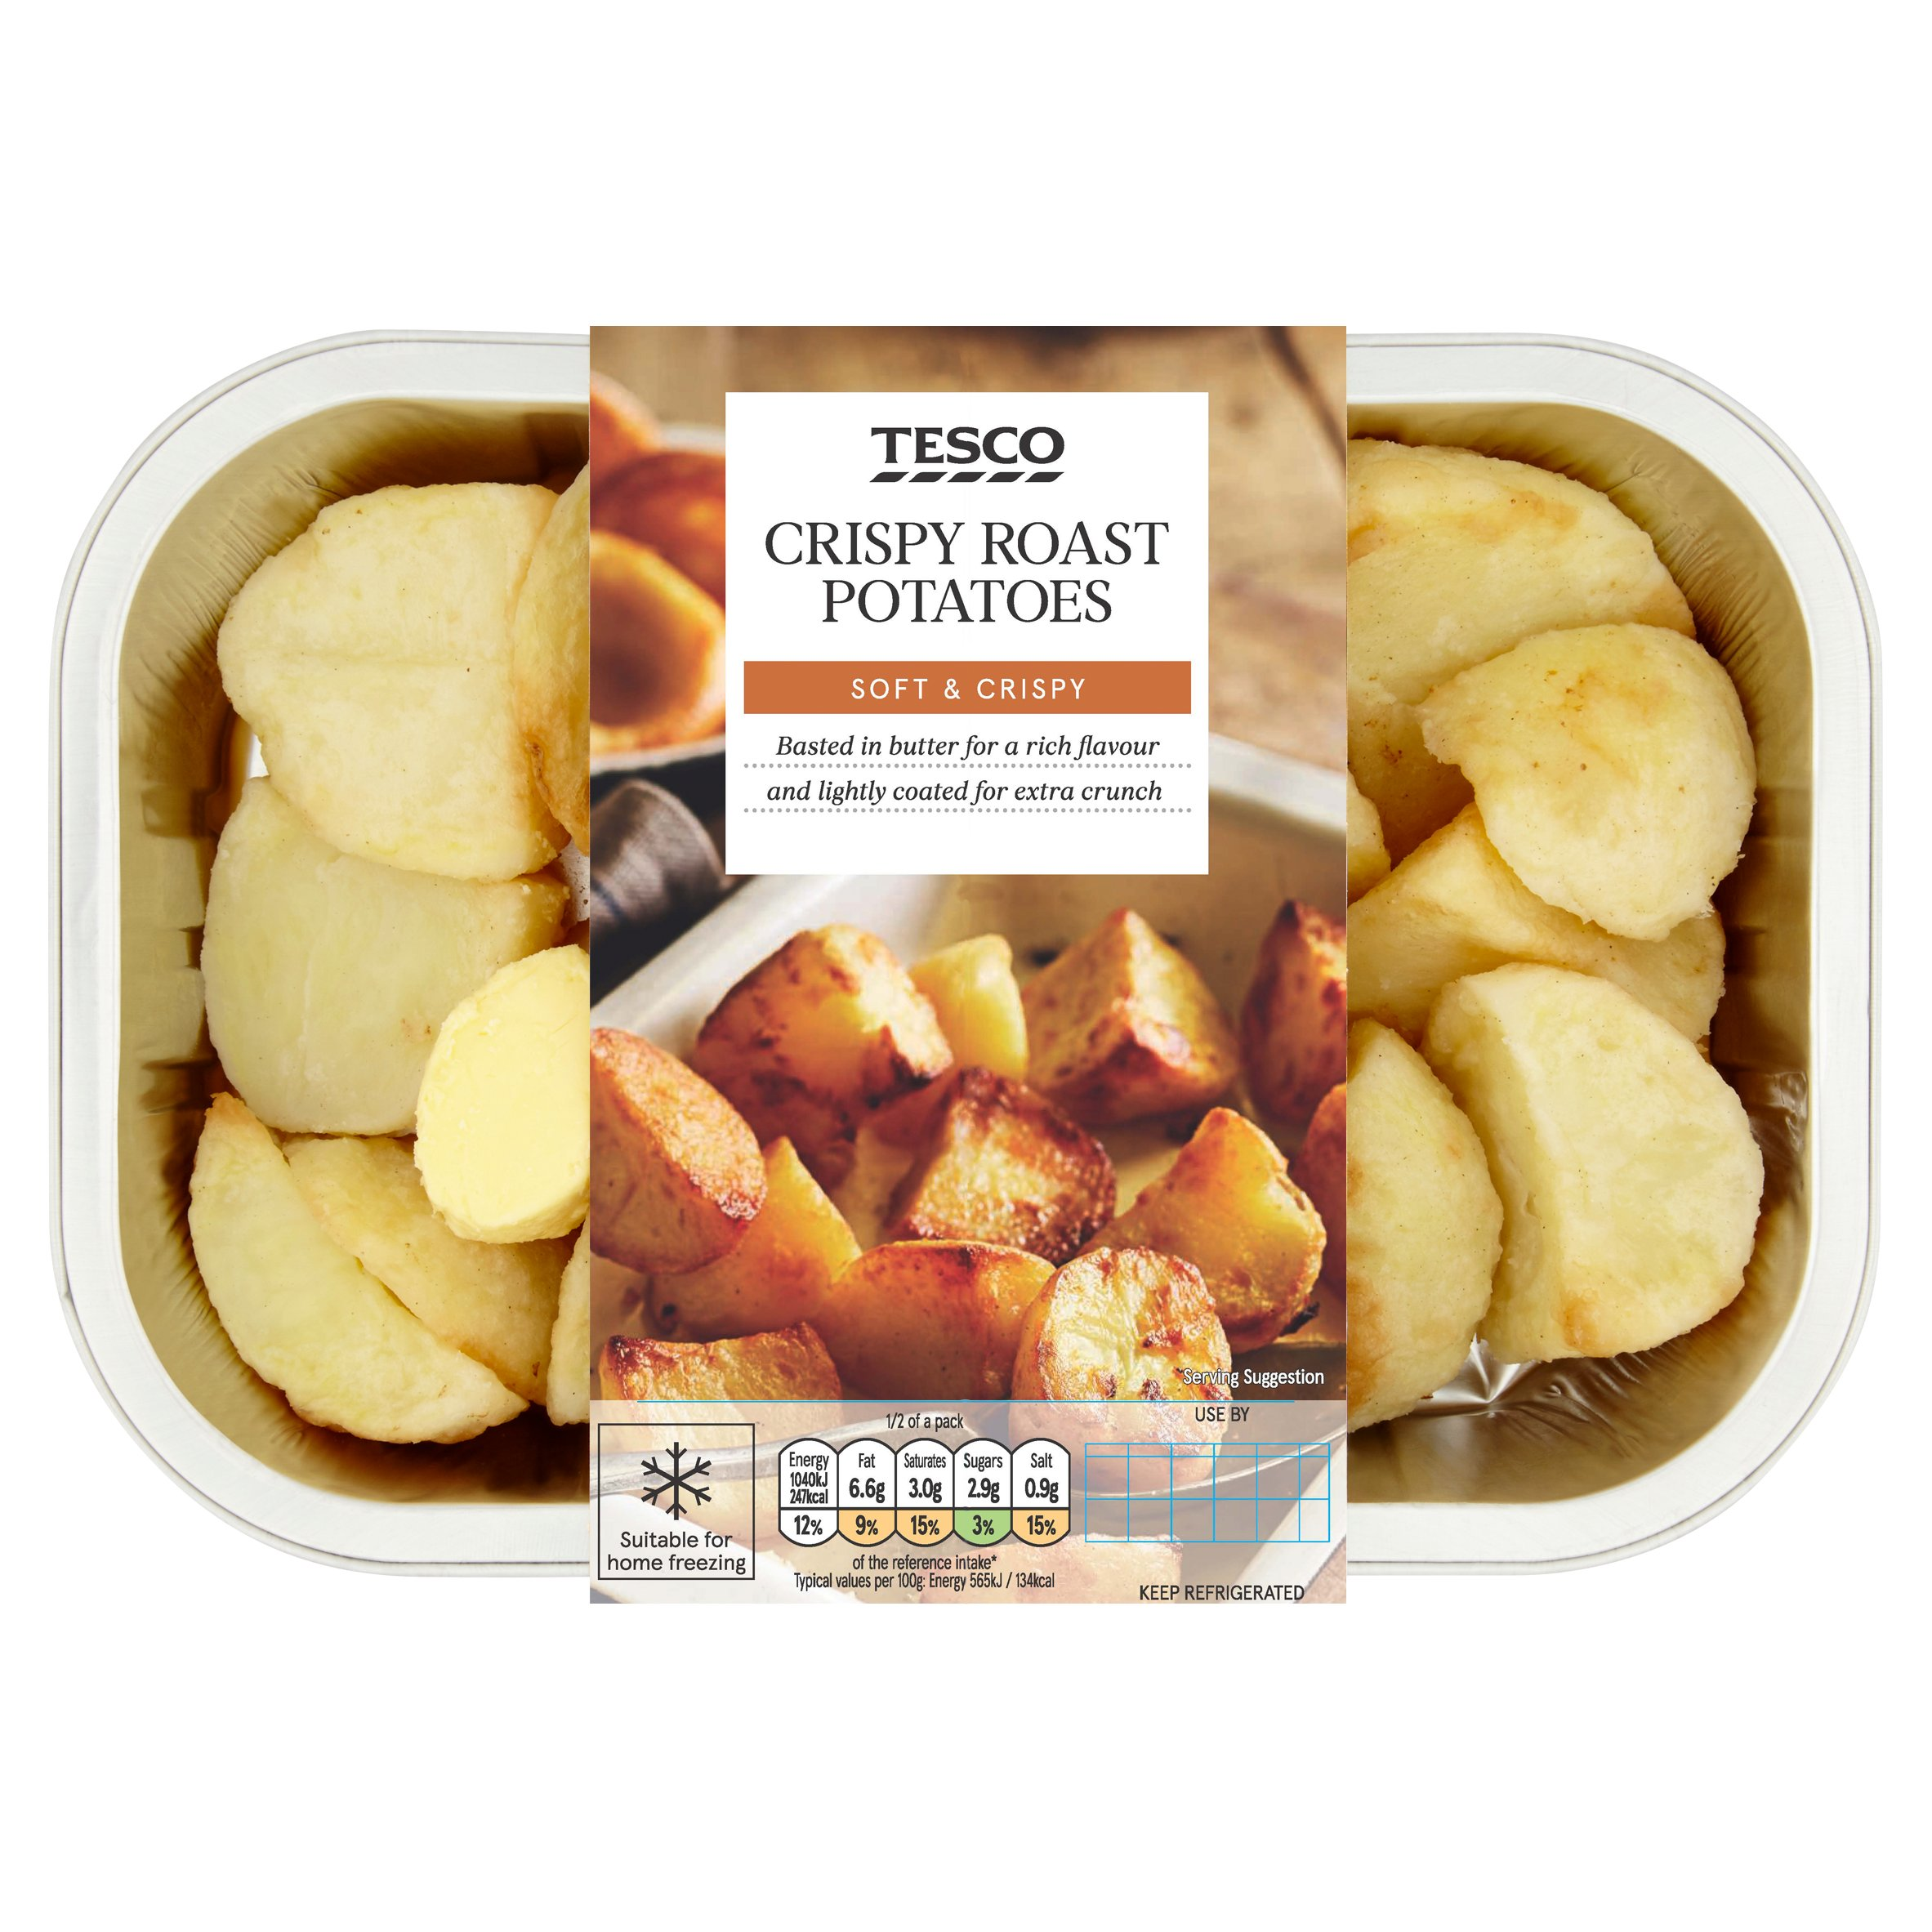 Tesco Crispy Roast Potatoes 450G